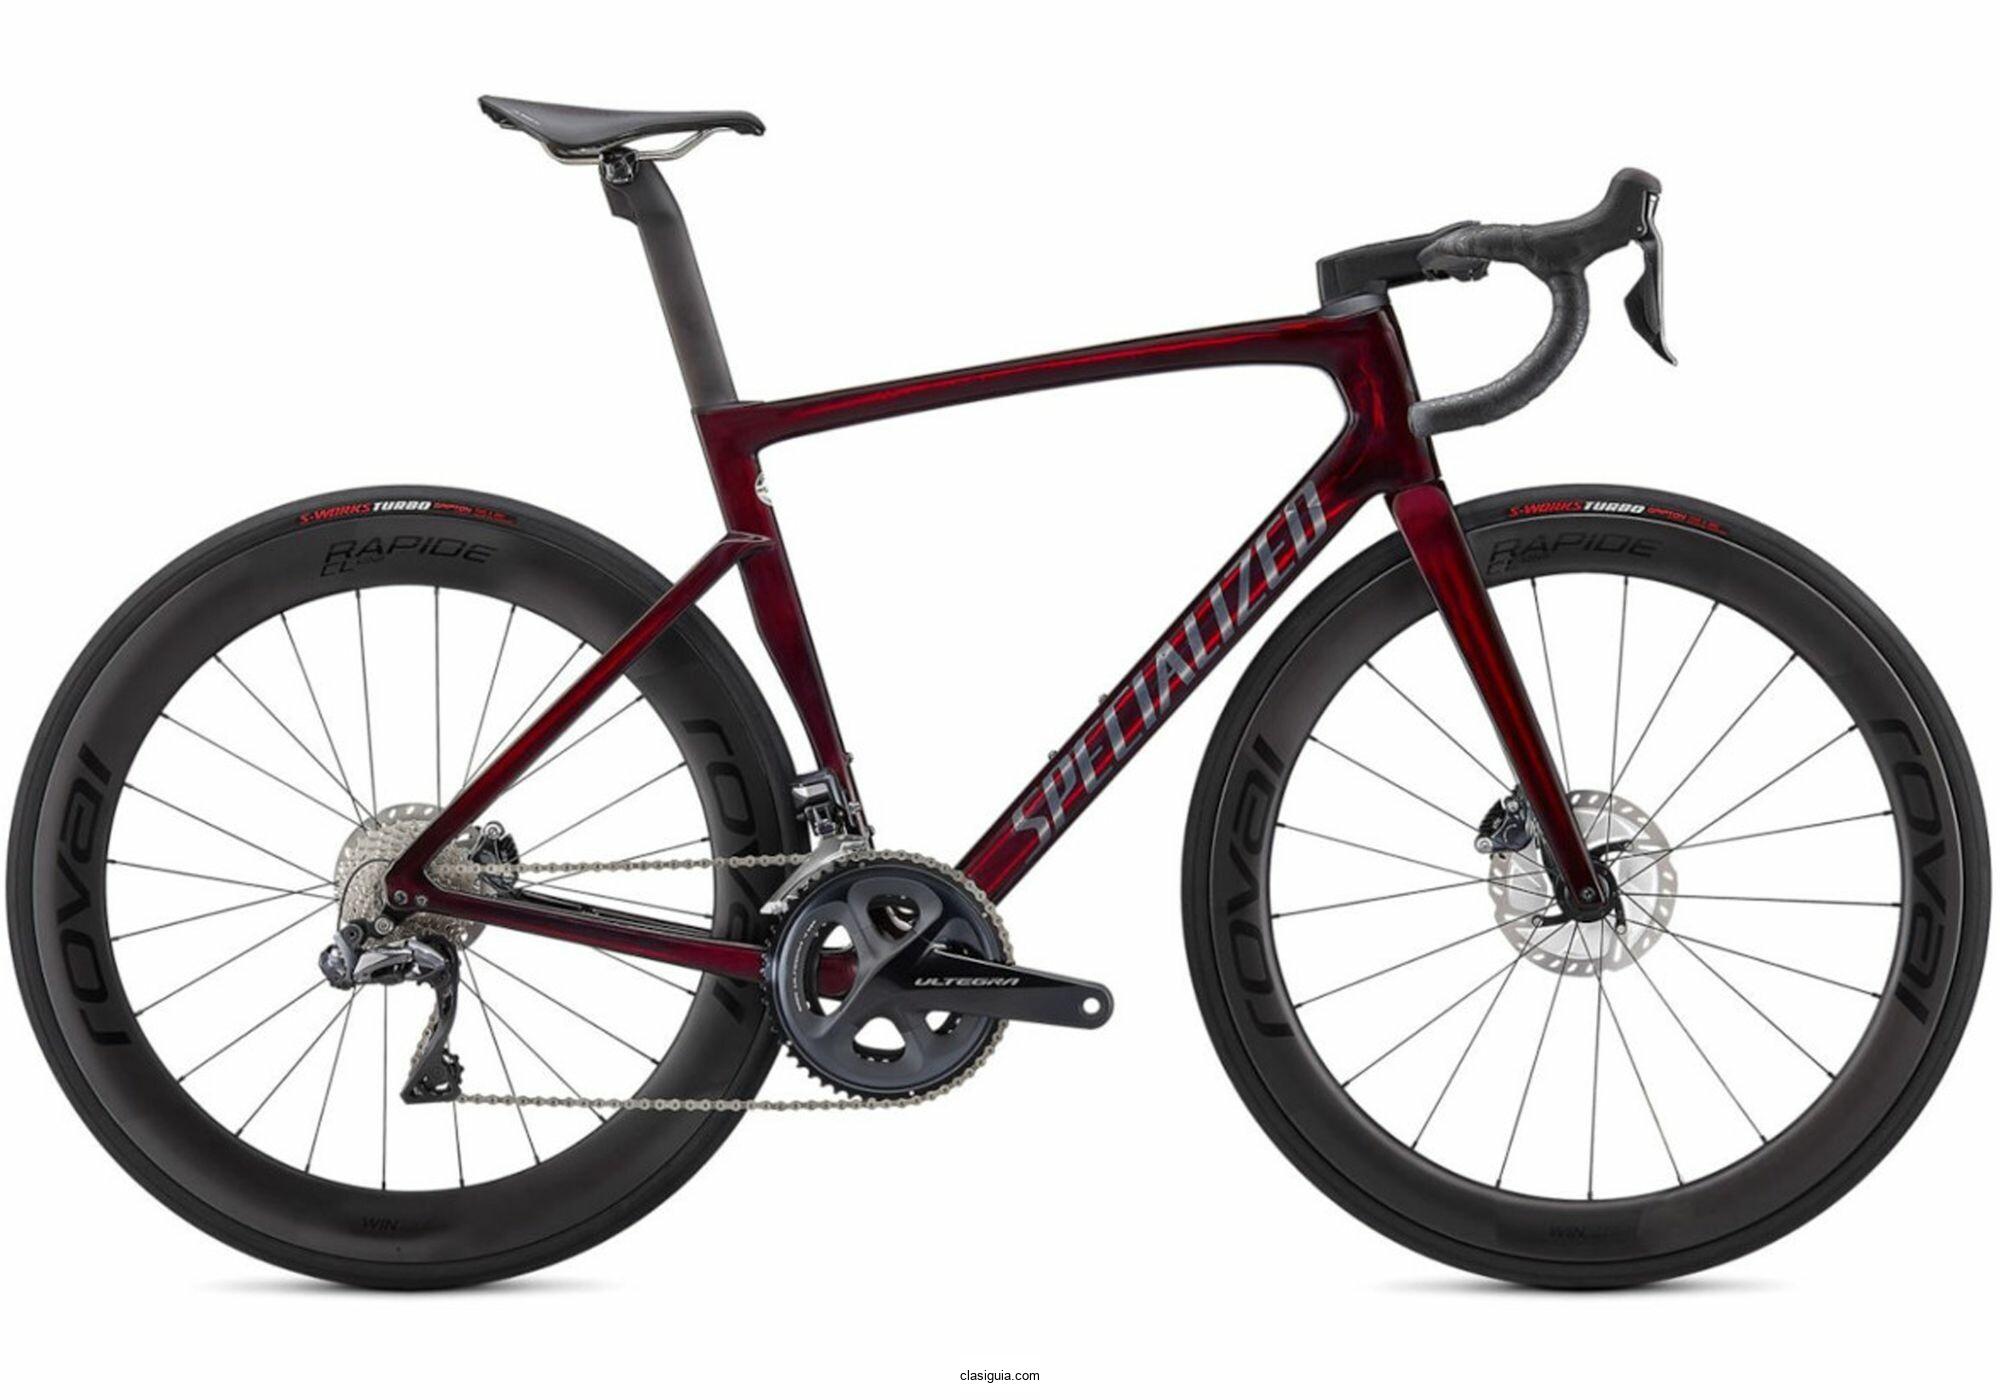 2021 - Specialized Road Bike TARMAC SL7 PRO Ultegra Di2 Carbon (RUNCYCLES)